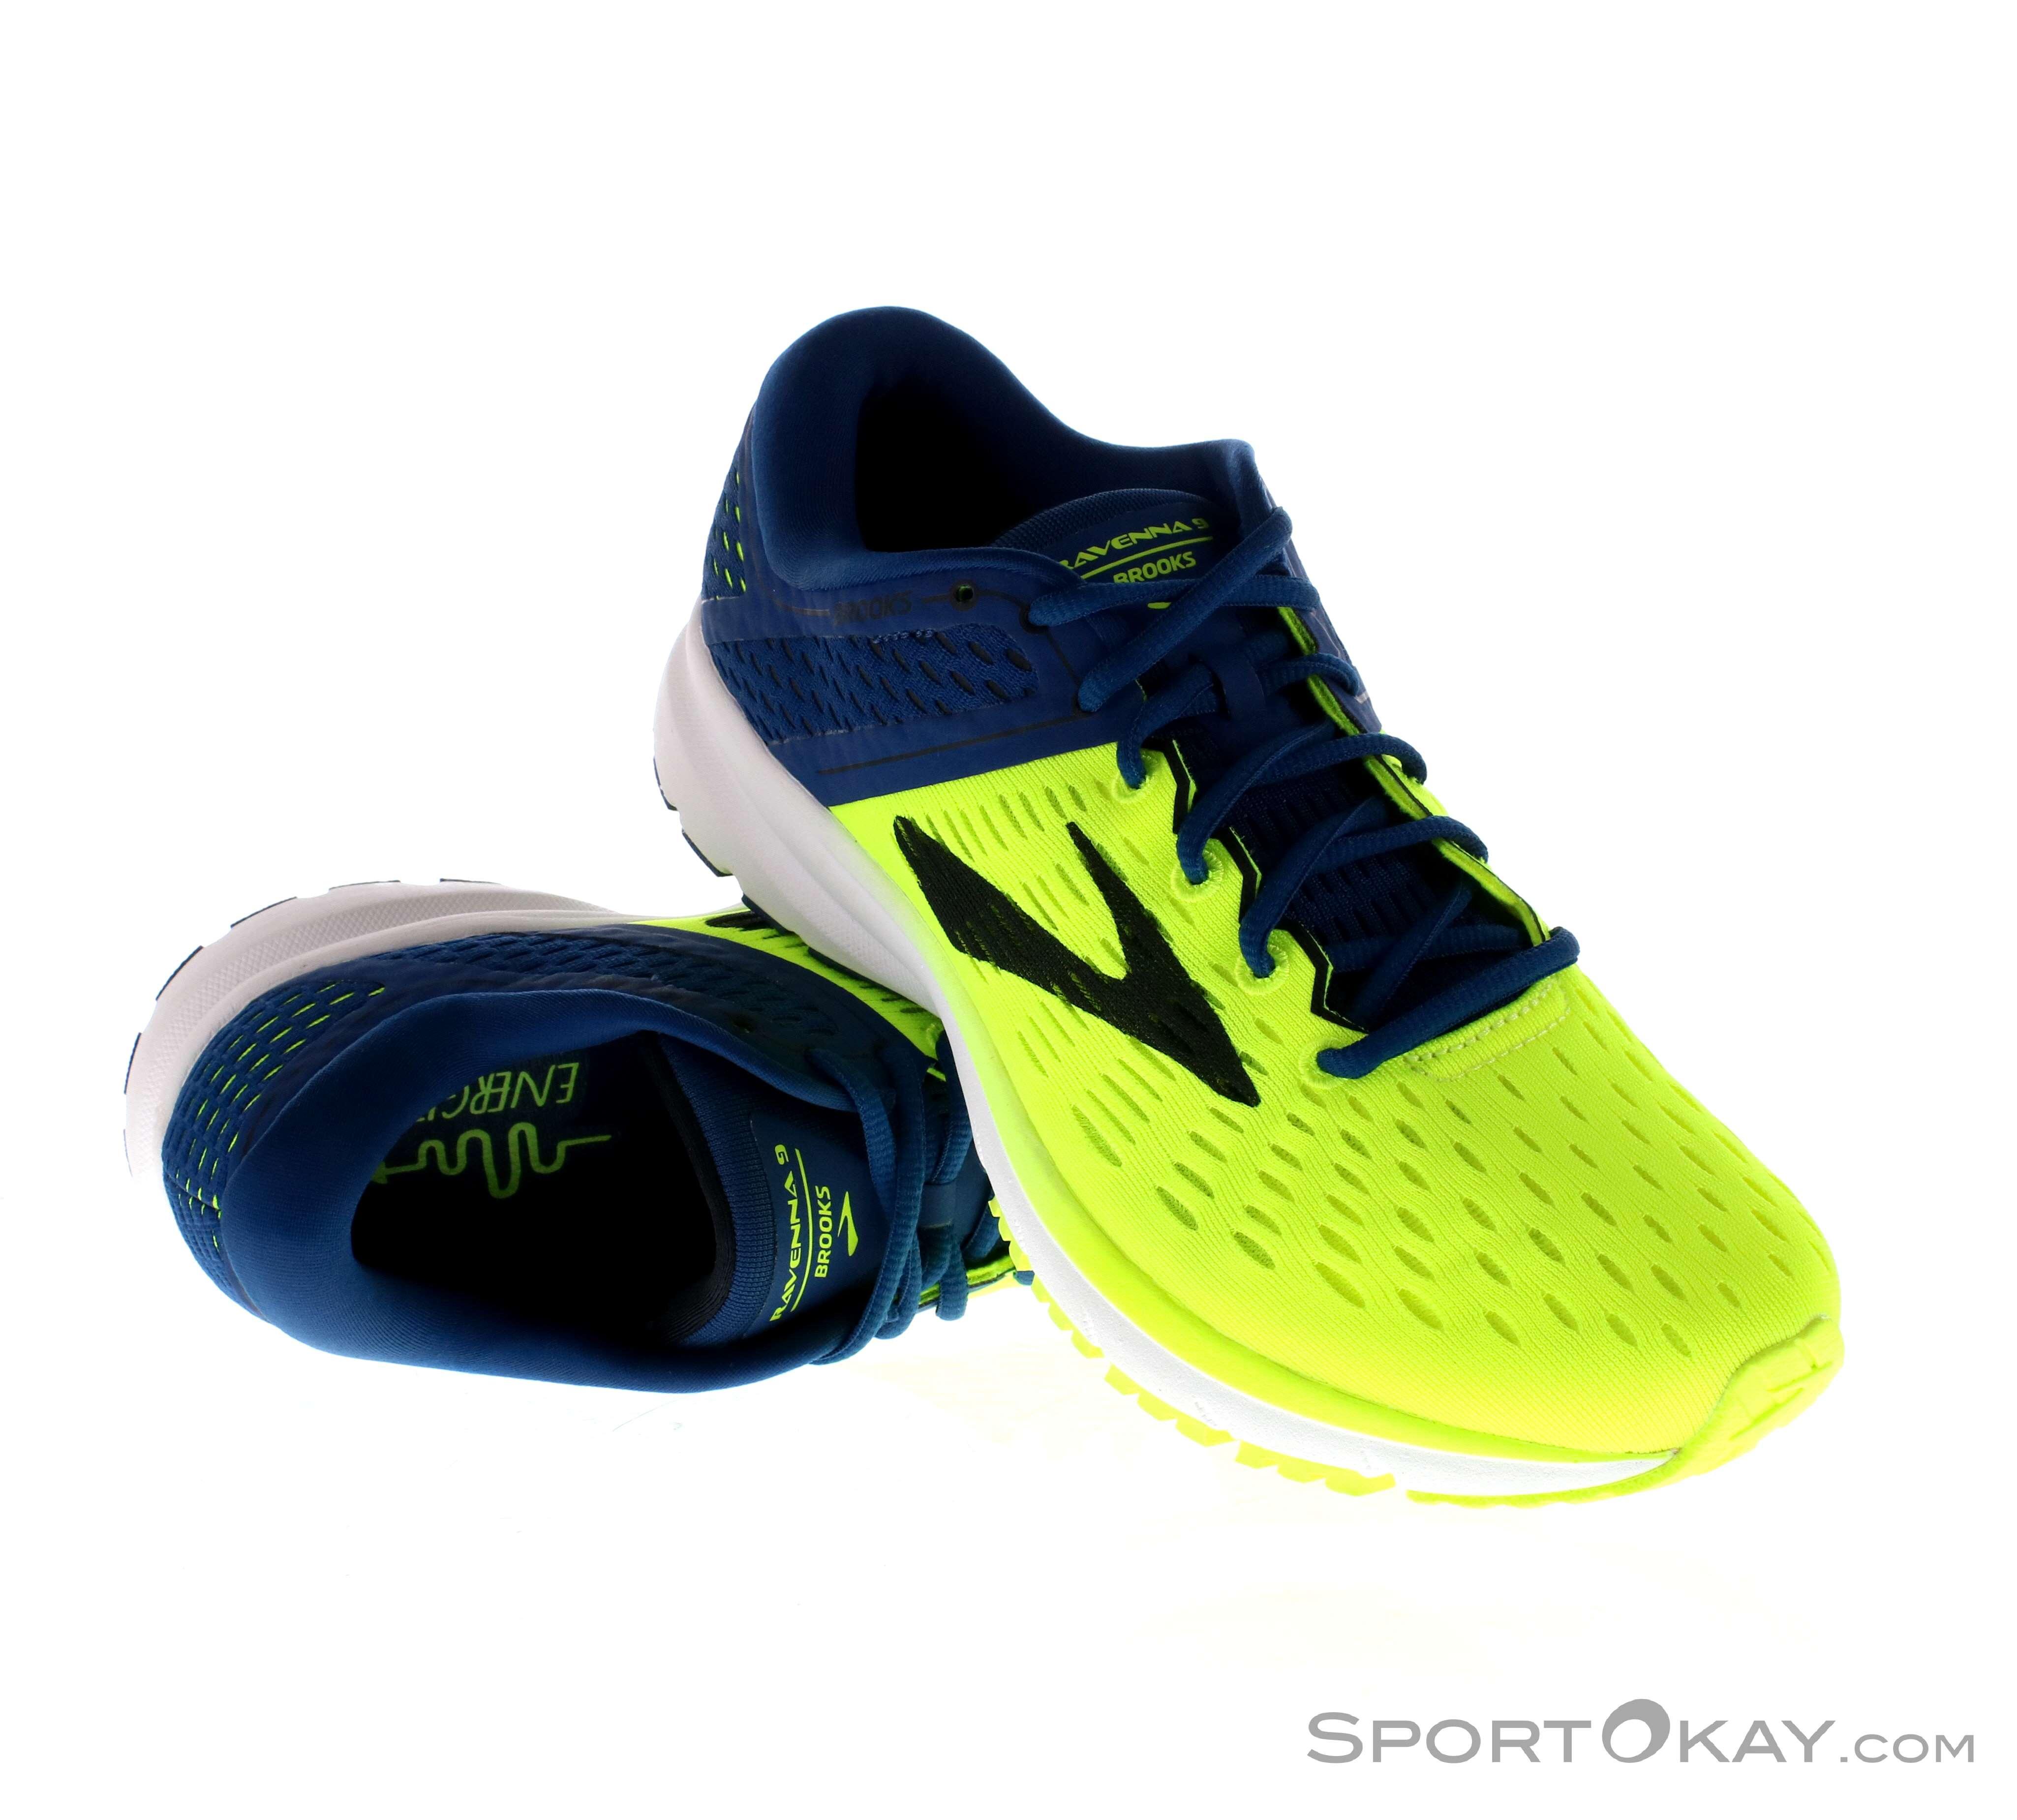 cheap for sale get online lovely design Brooks Brooks Ravenna 9 Mens Running Shoes